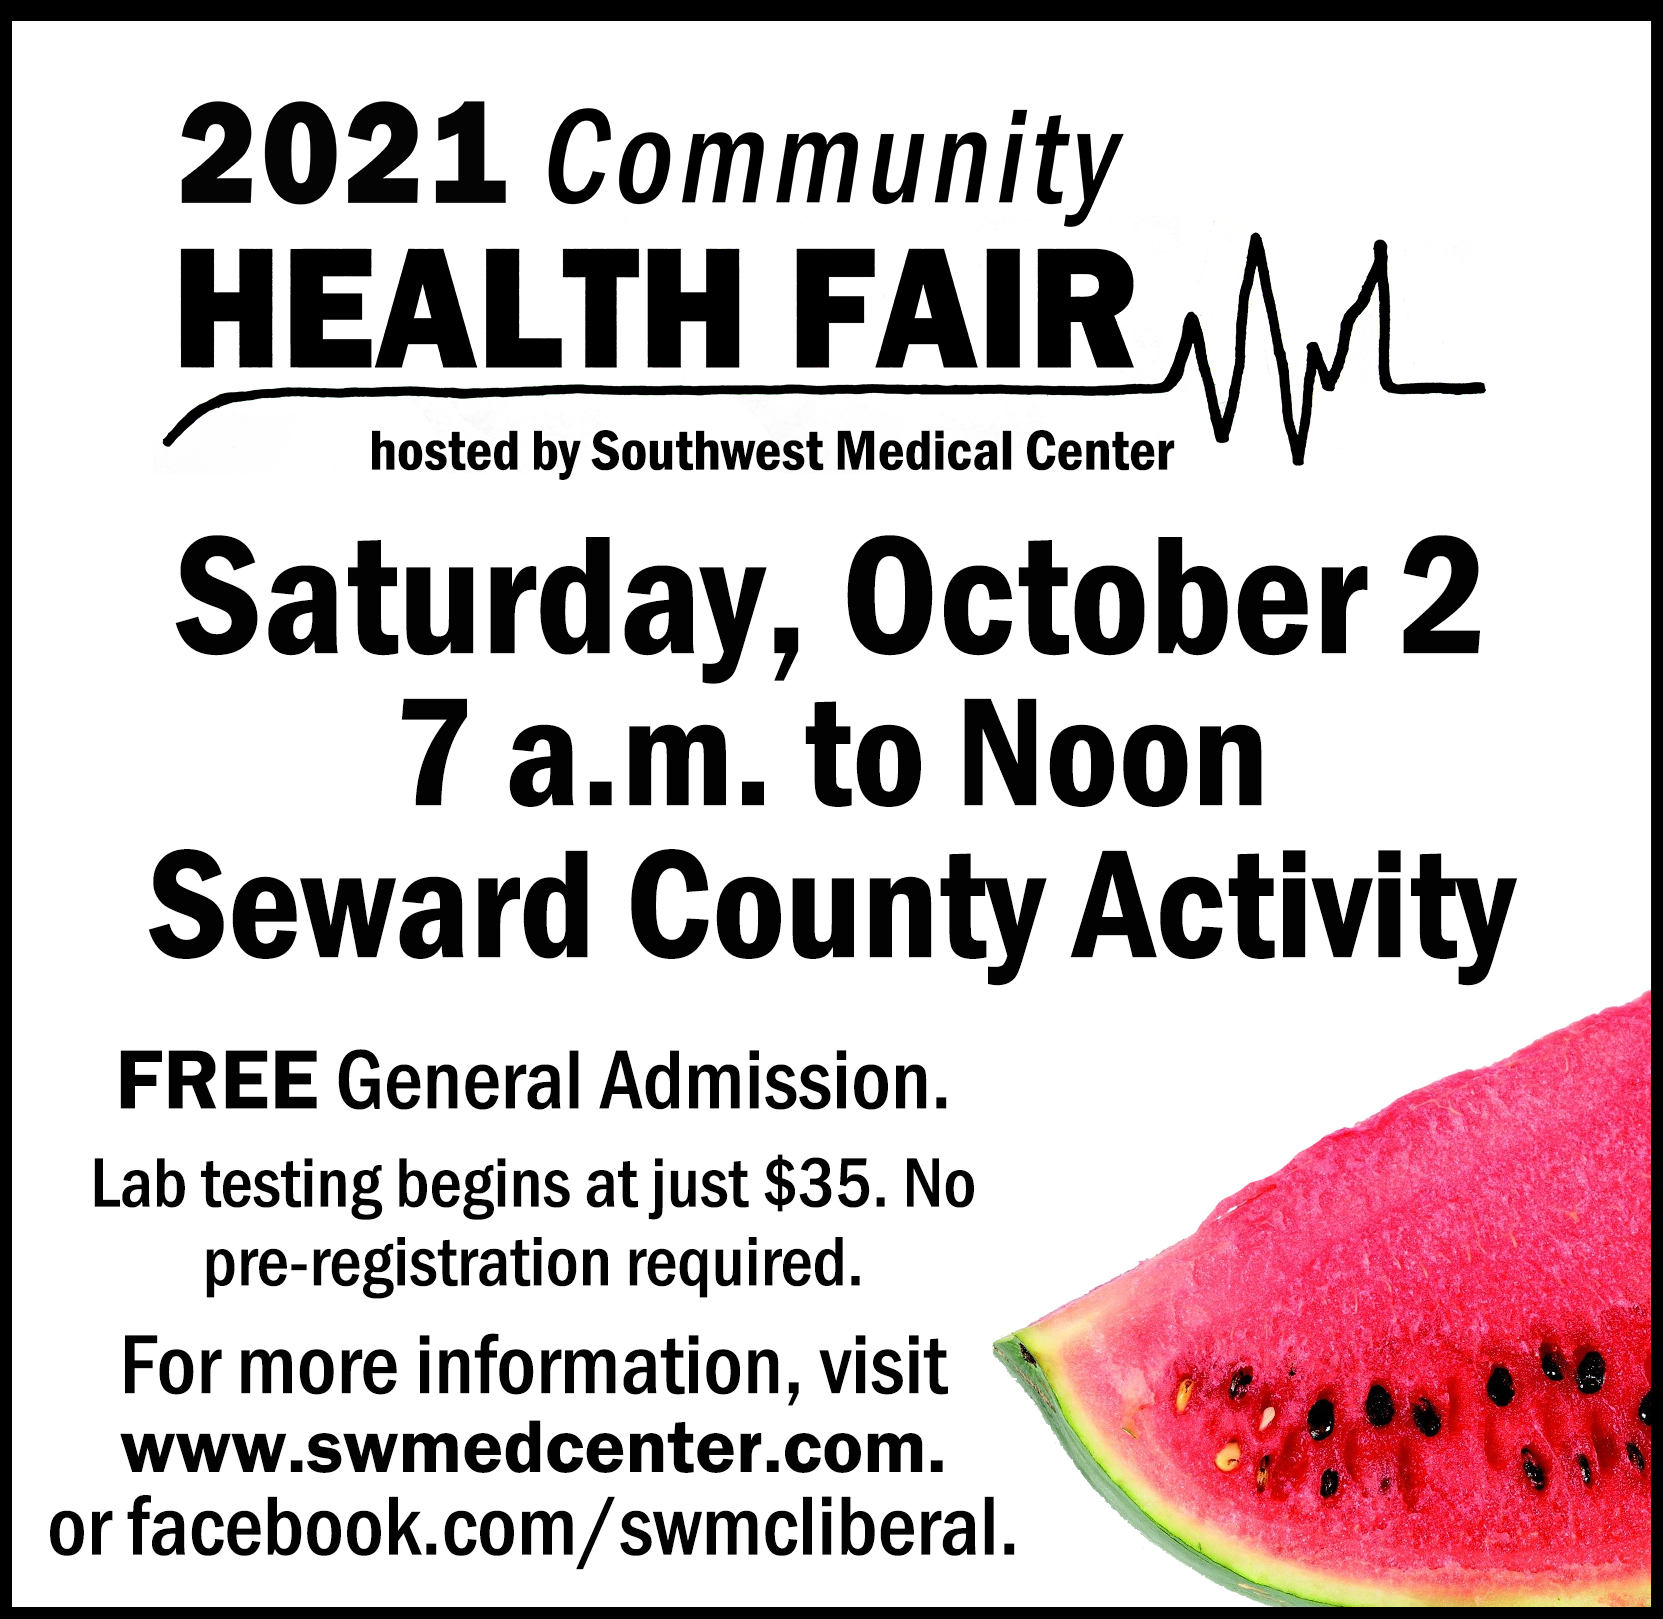 12th Annual Community Health Fair on Oct. 2